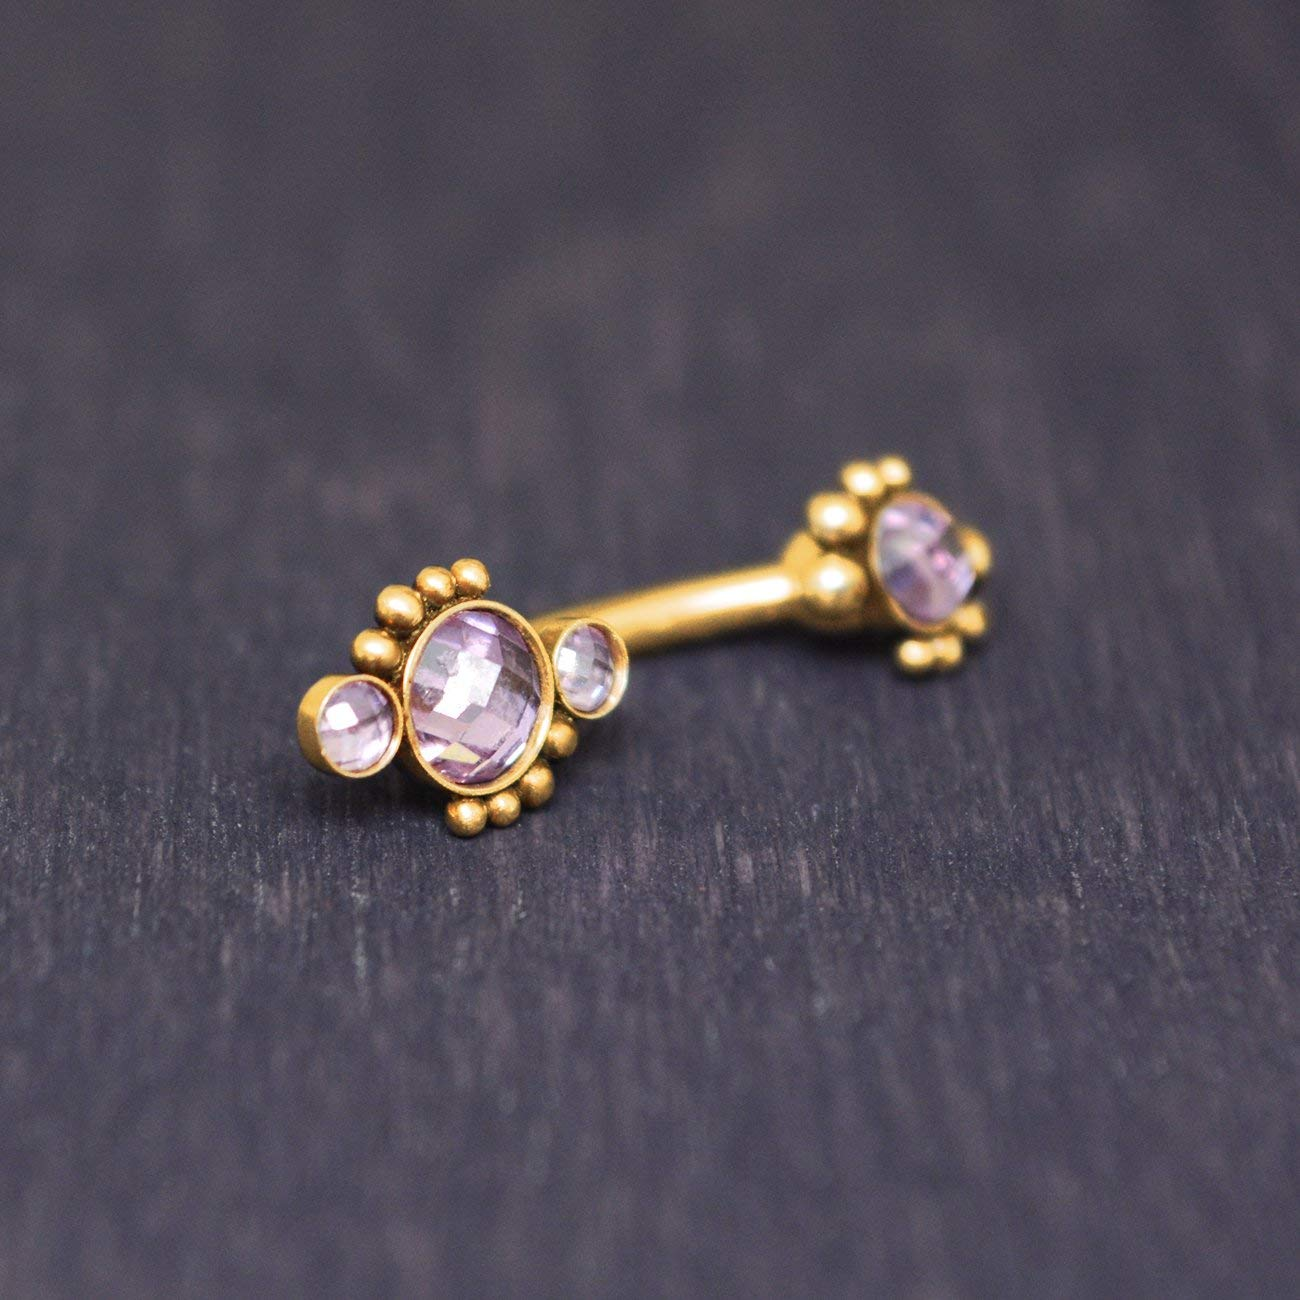 13//32 1.6mm Long 5 11mm Jewelry by Sweet Pea SGSS Curv BB w Upside Down Gem Charm 14G